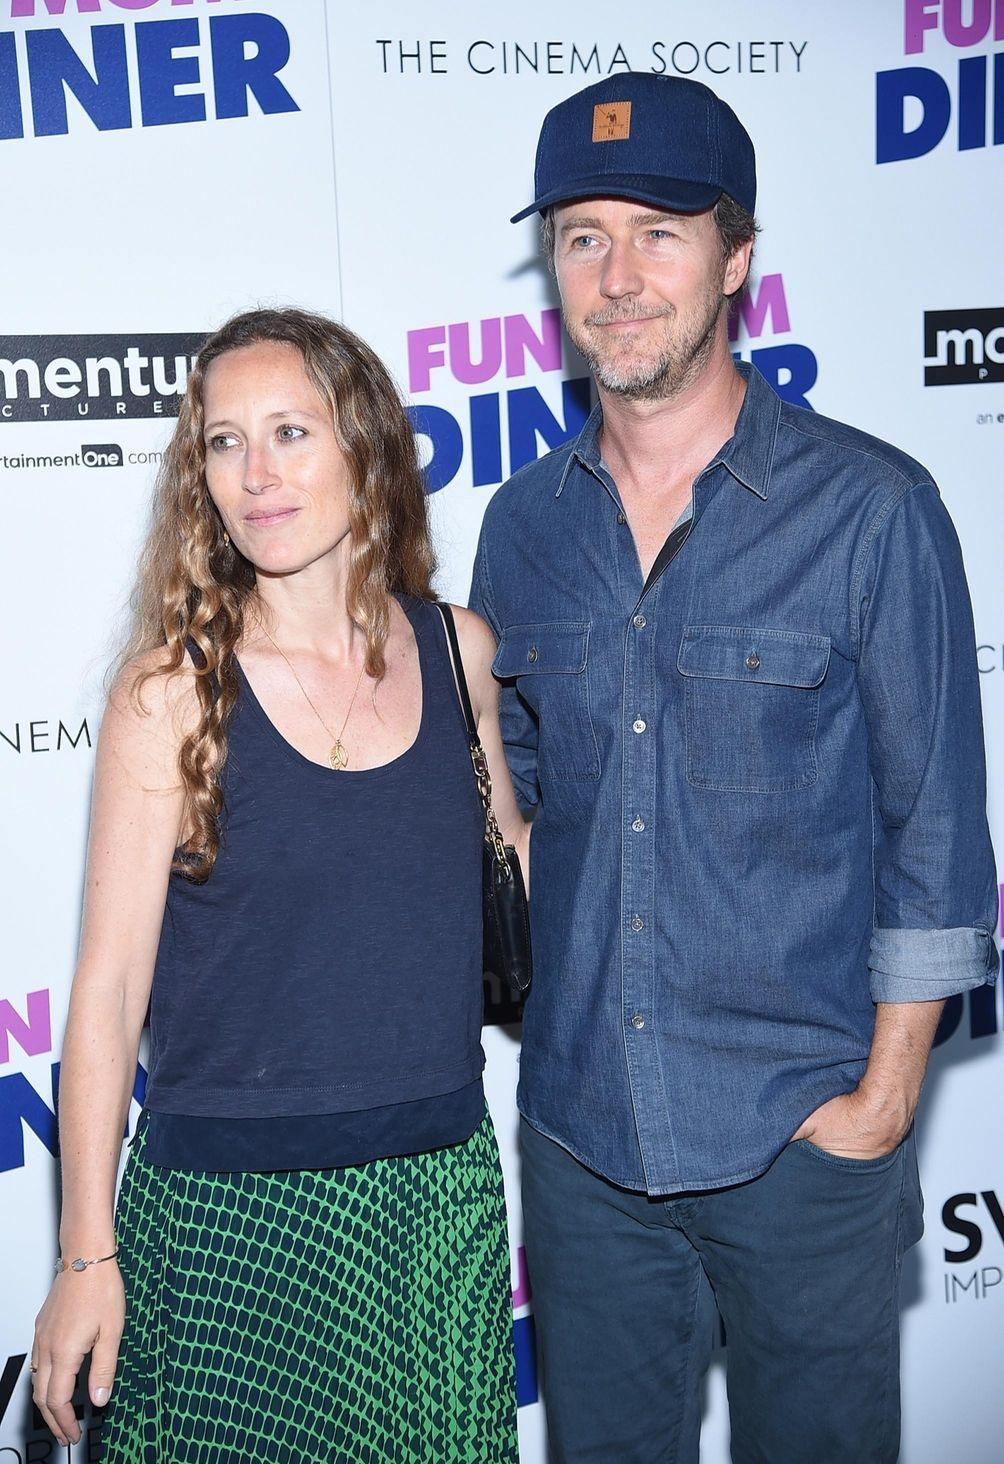 Shauna Robertson and Edward Norton attend a screening